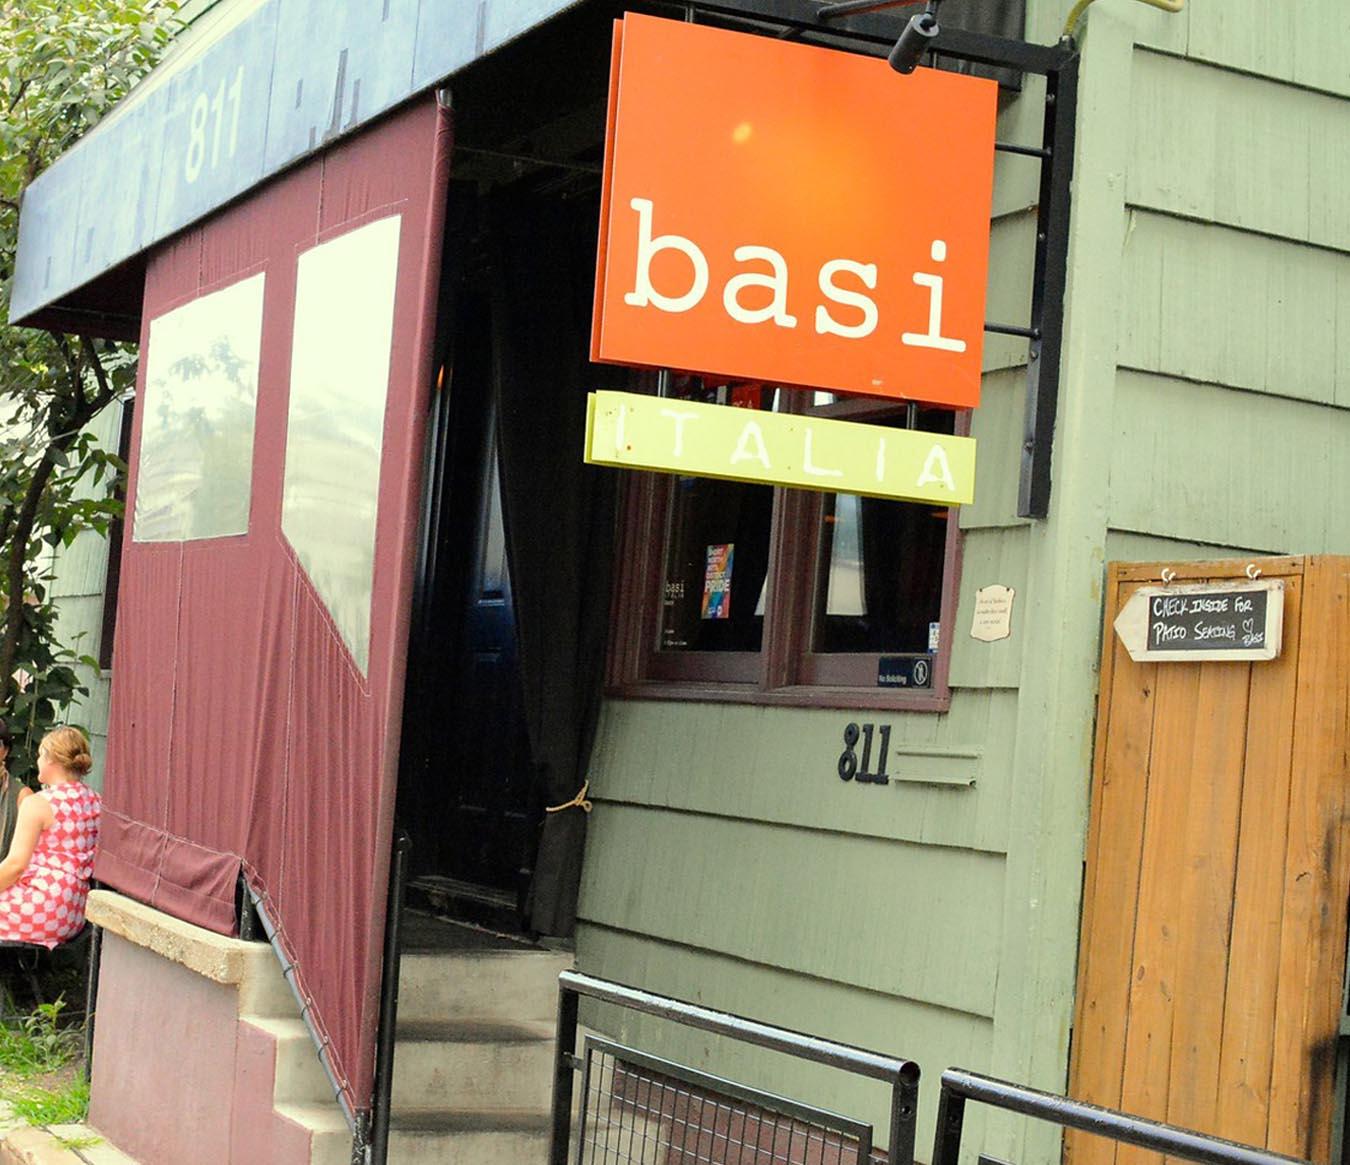 Where to Eat In Columbus - Basi Italia